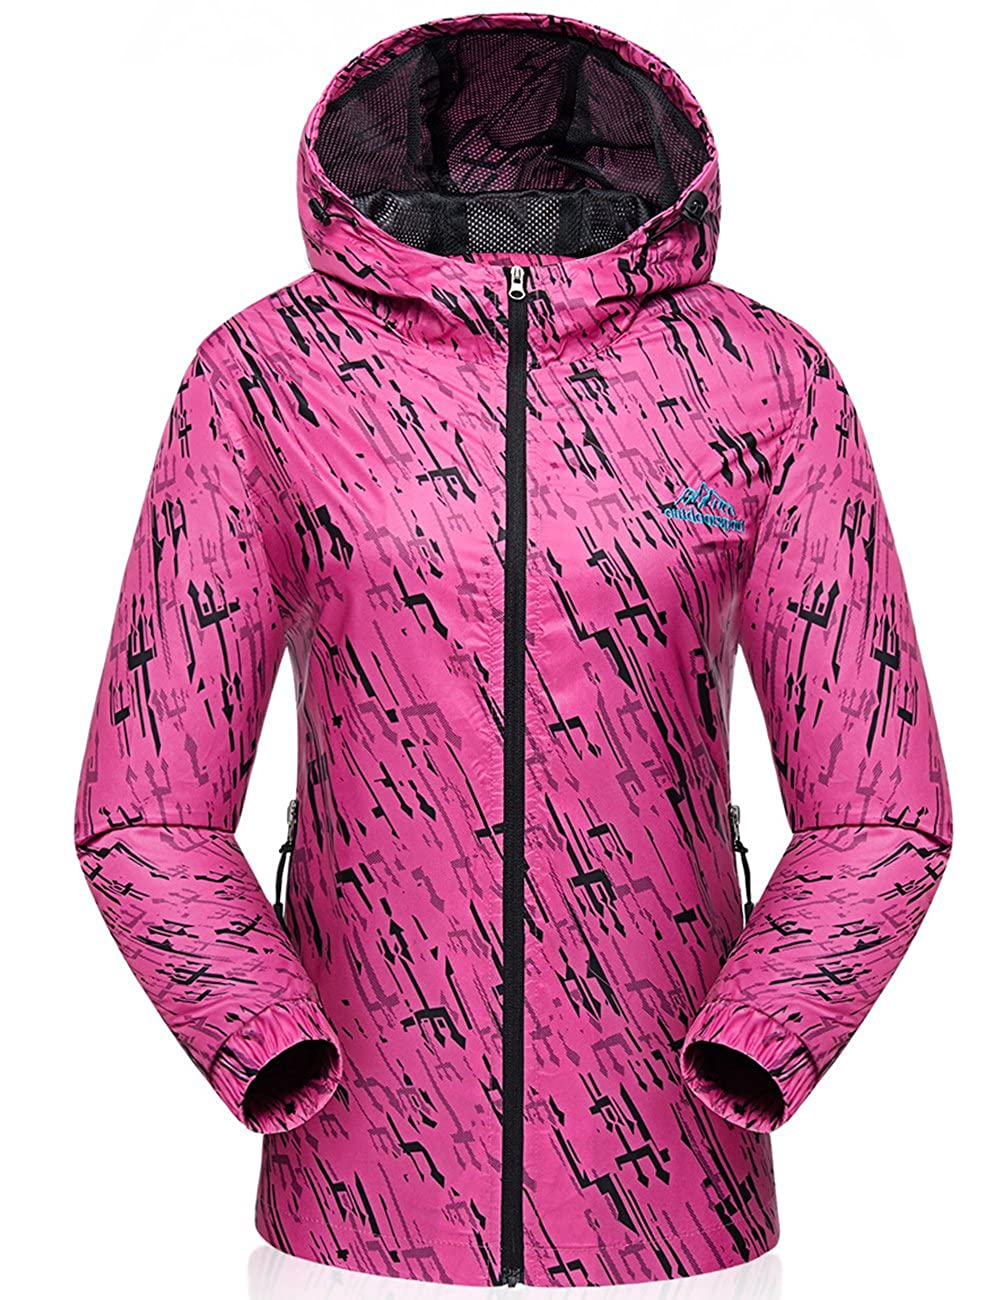 Yifun Outdoor Womens Waterproof Windproof Jacket Raincoat Lightweight Windbreaker